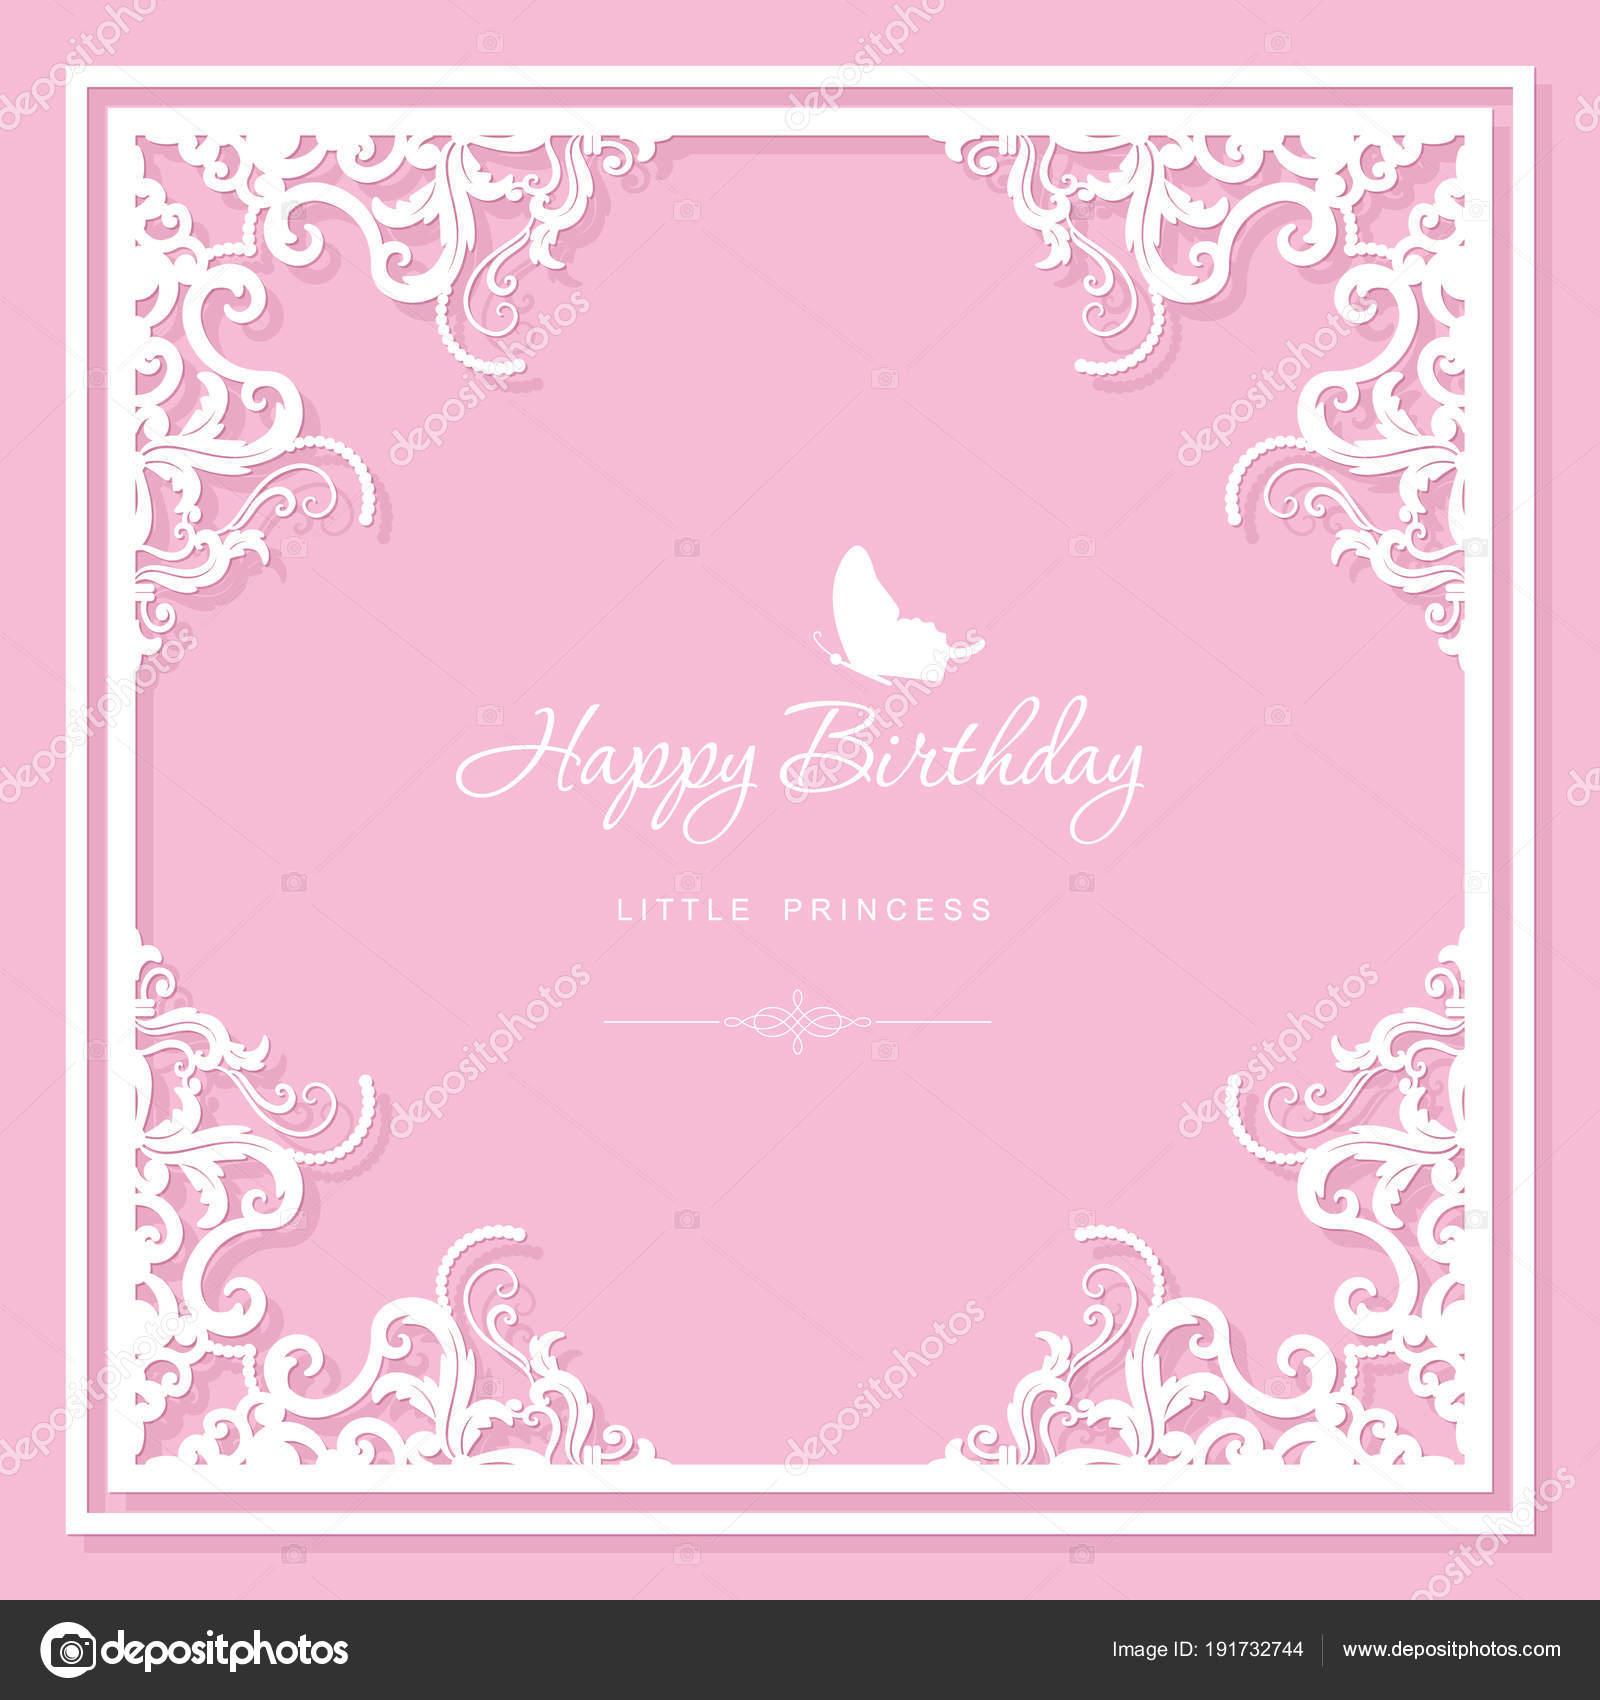 Elegant Decorative Frame Birthday Greeting Card Template Filigree